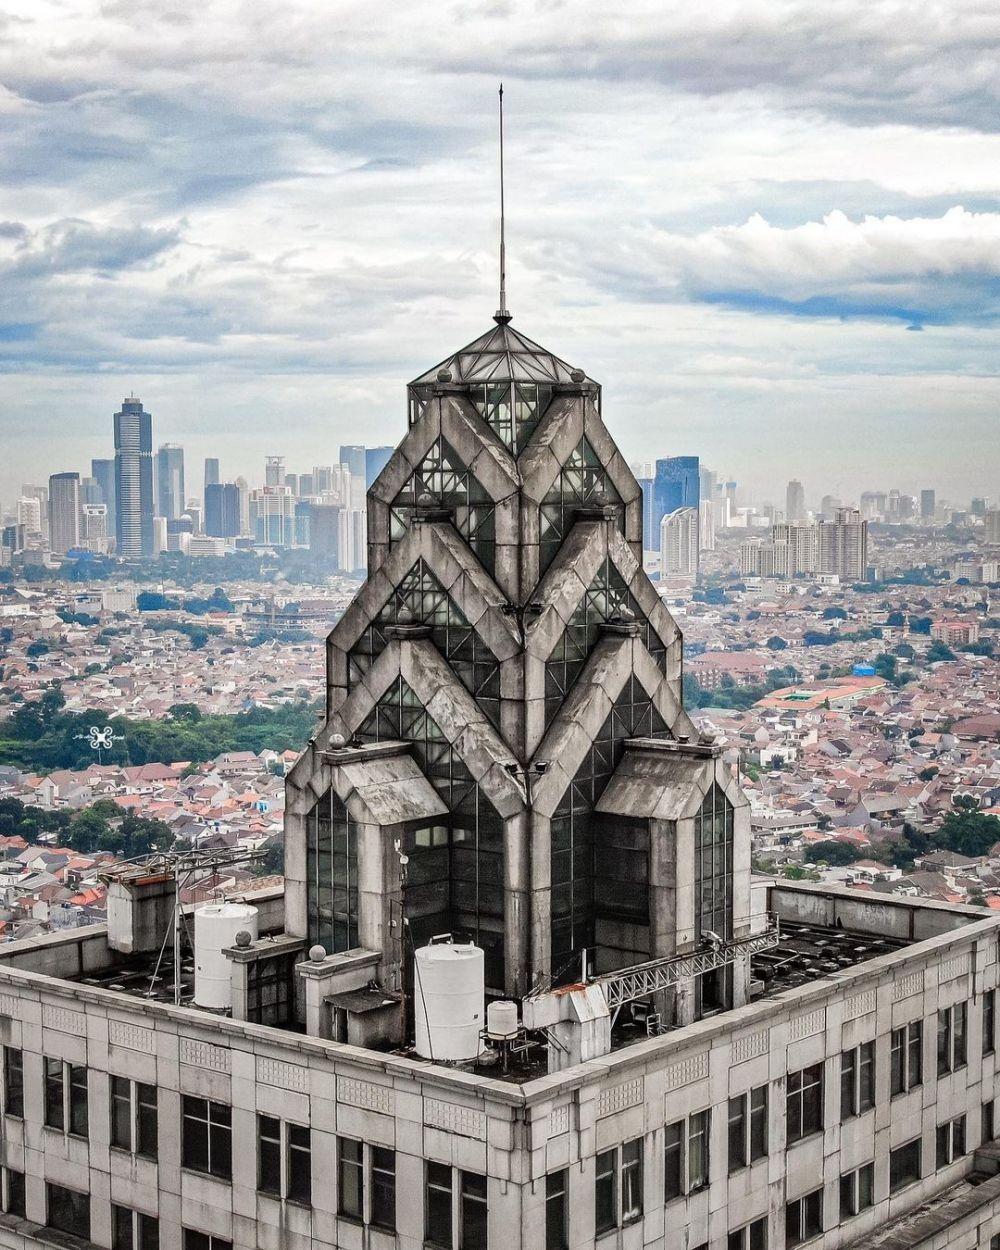 10 Bangunan Paling Angker di Indonesia, Dipenuhi Makhluk Gaib